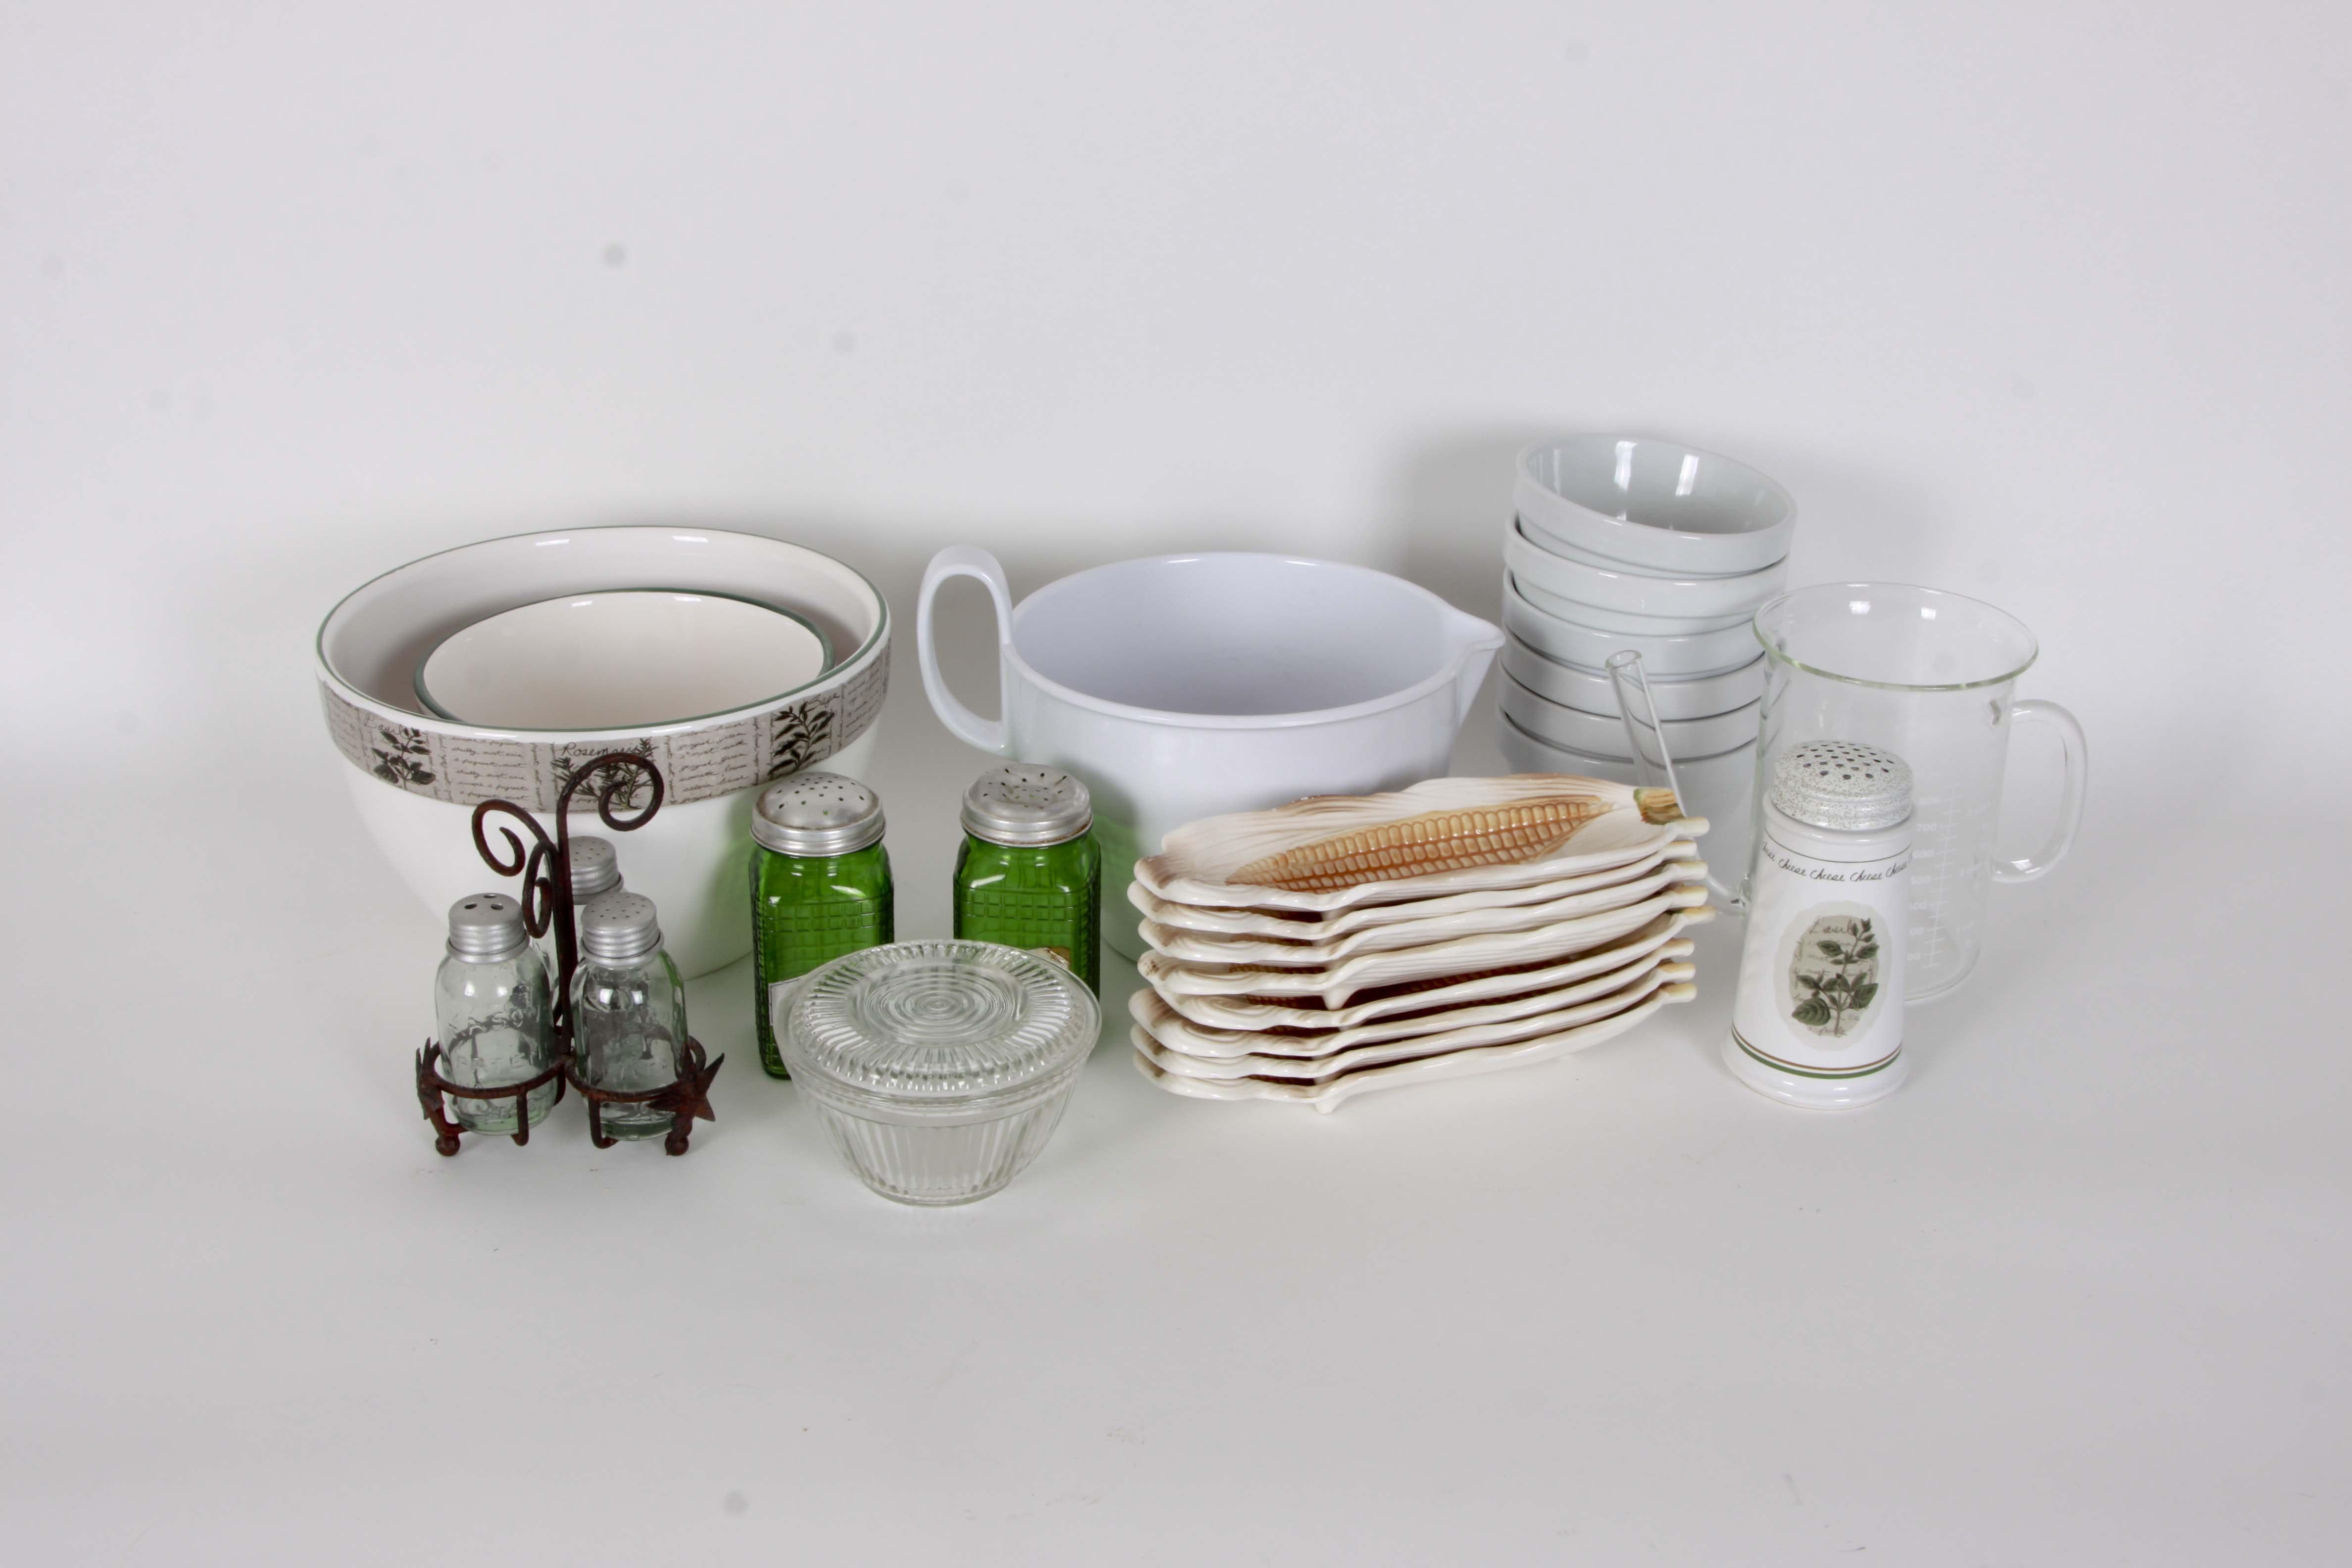 Kitchenware Collection including Dansk